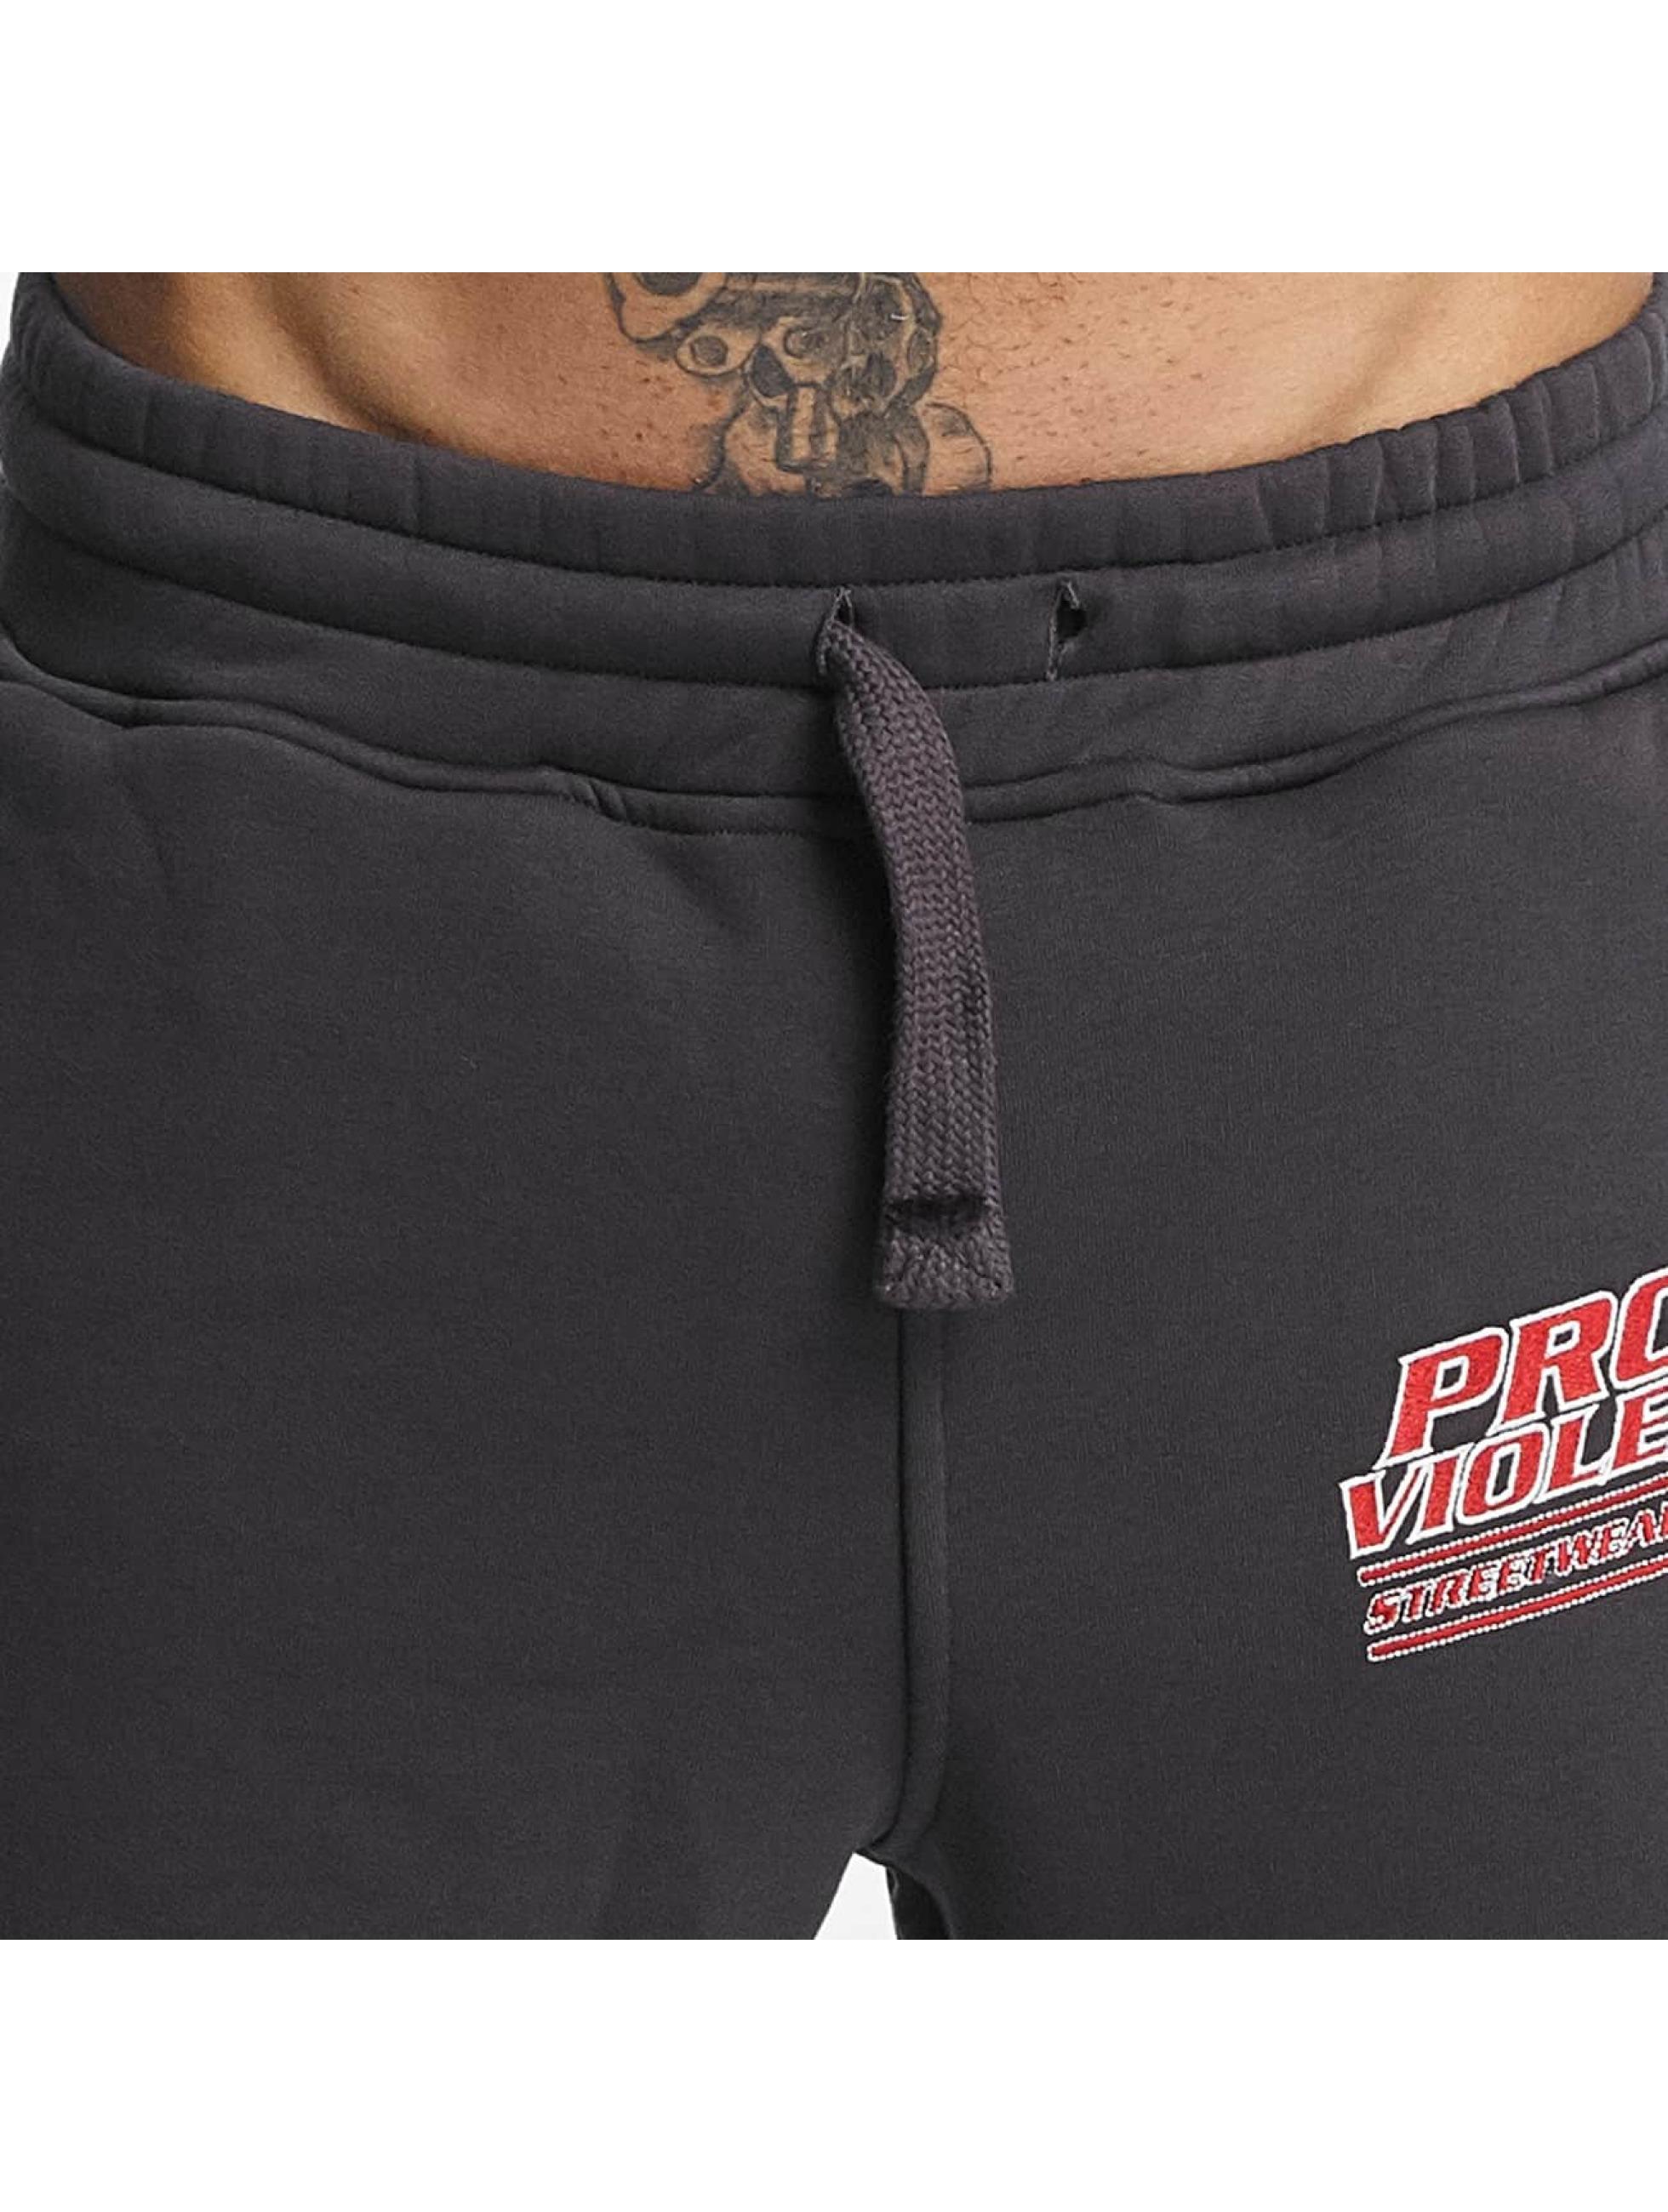 Pro Violence Streetwear Pantalón deportivo Label No. 1 gris